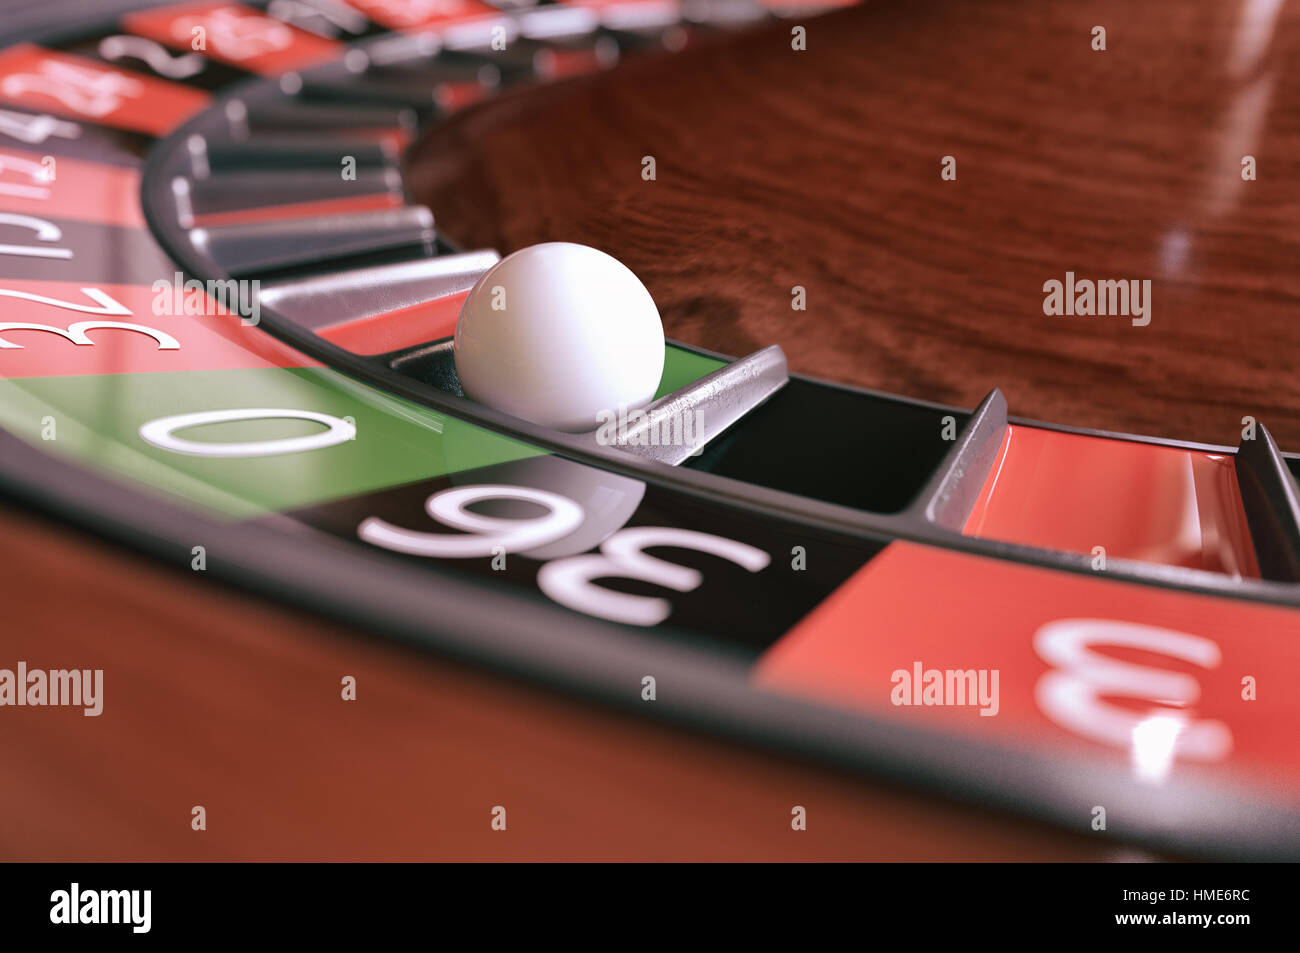 Roulette wheel closeup - 3D Rendering - Stock Image